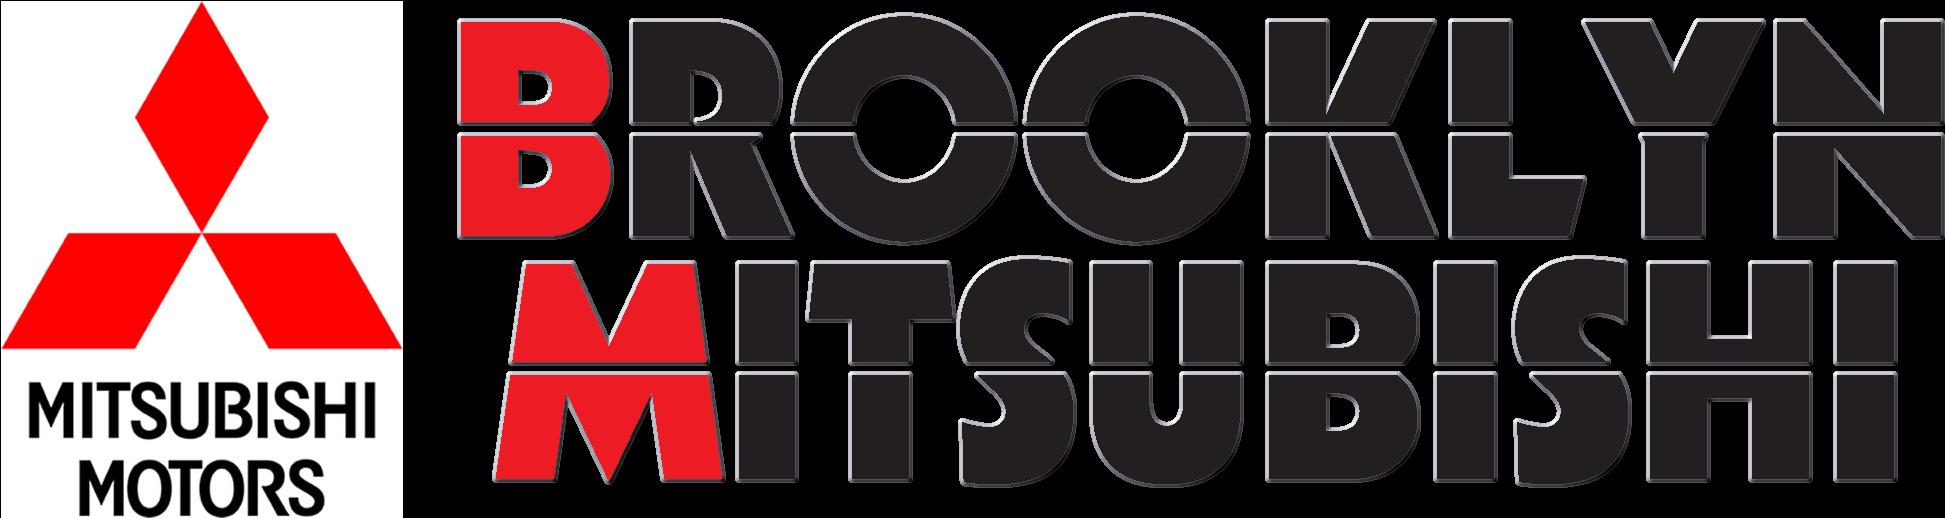 Download Brooklyn Mitsubishi Logo - Full Size PNG Image - PNGkit